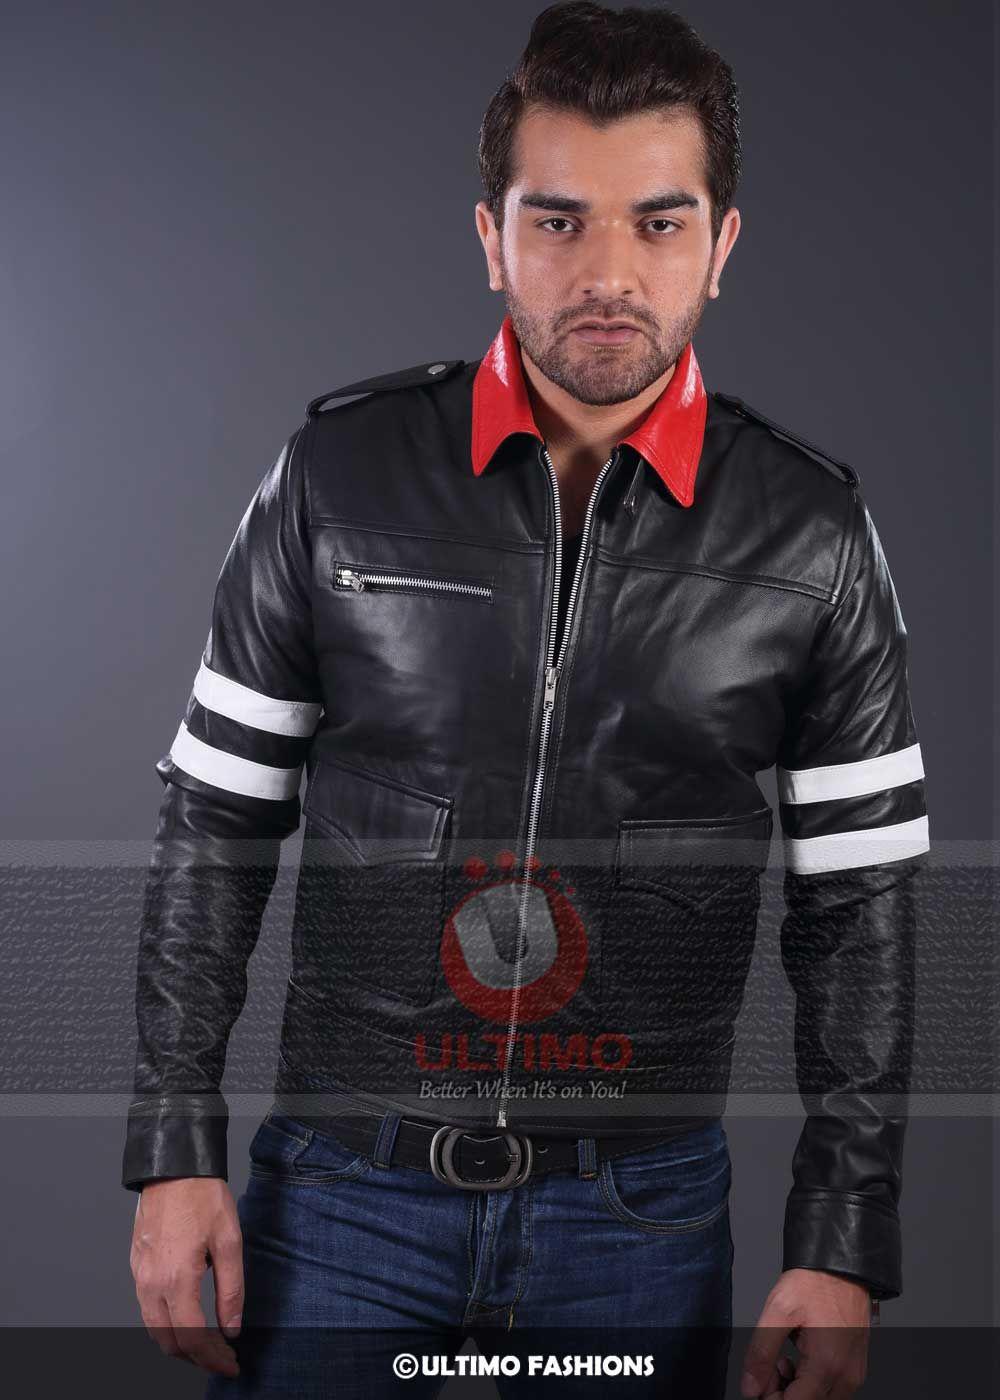 Game Alex Mercer Prototype Leather Jacket The skinny style